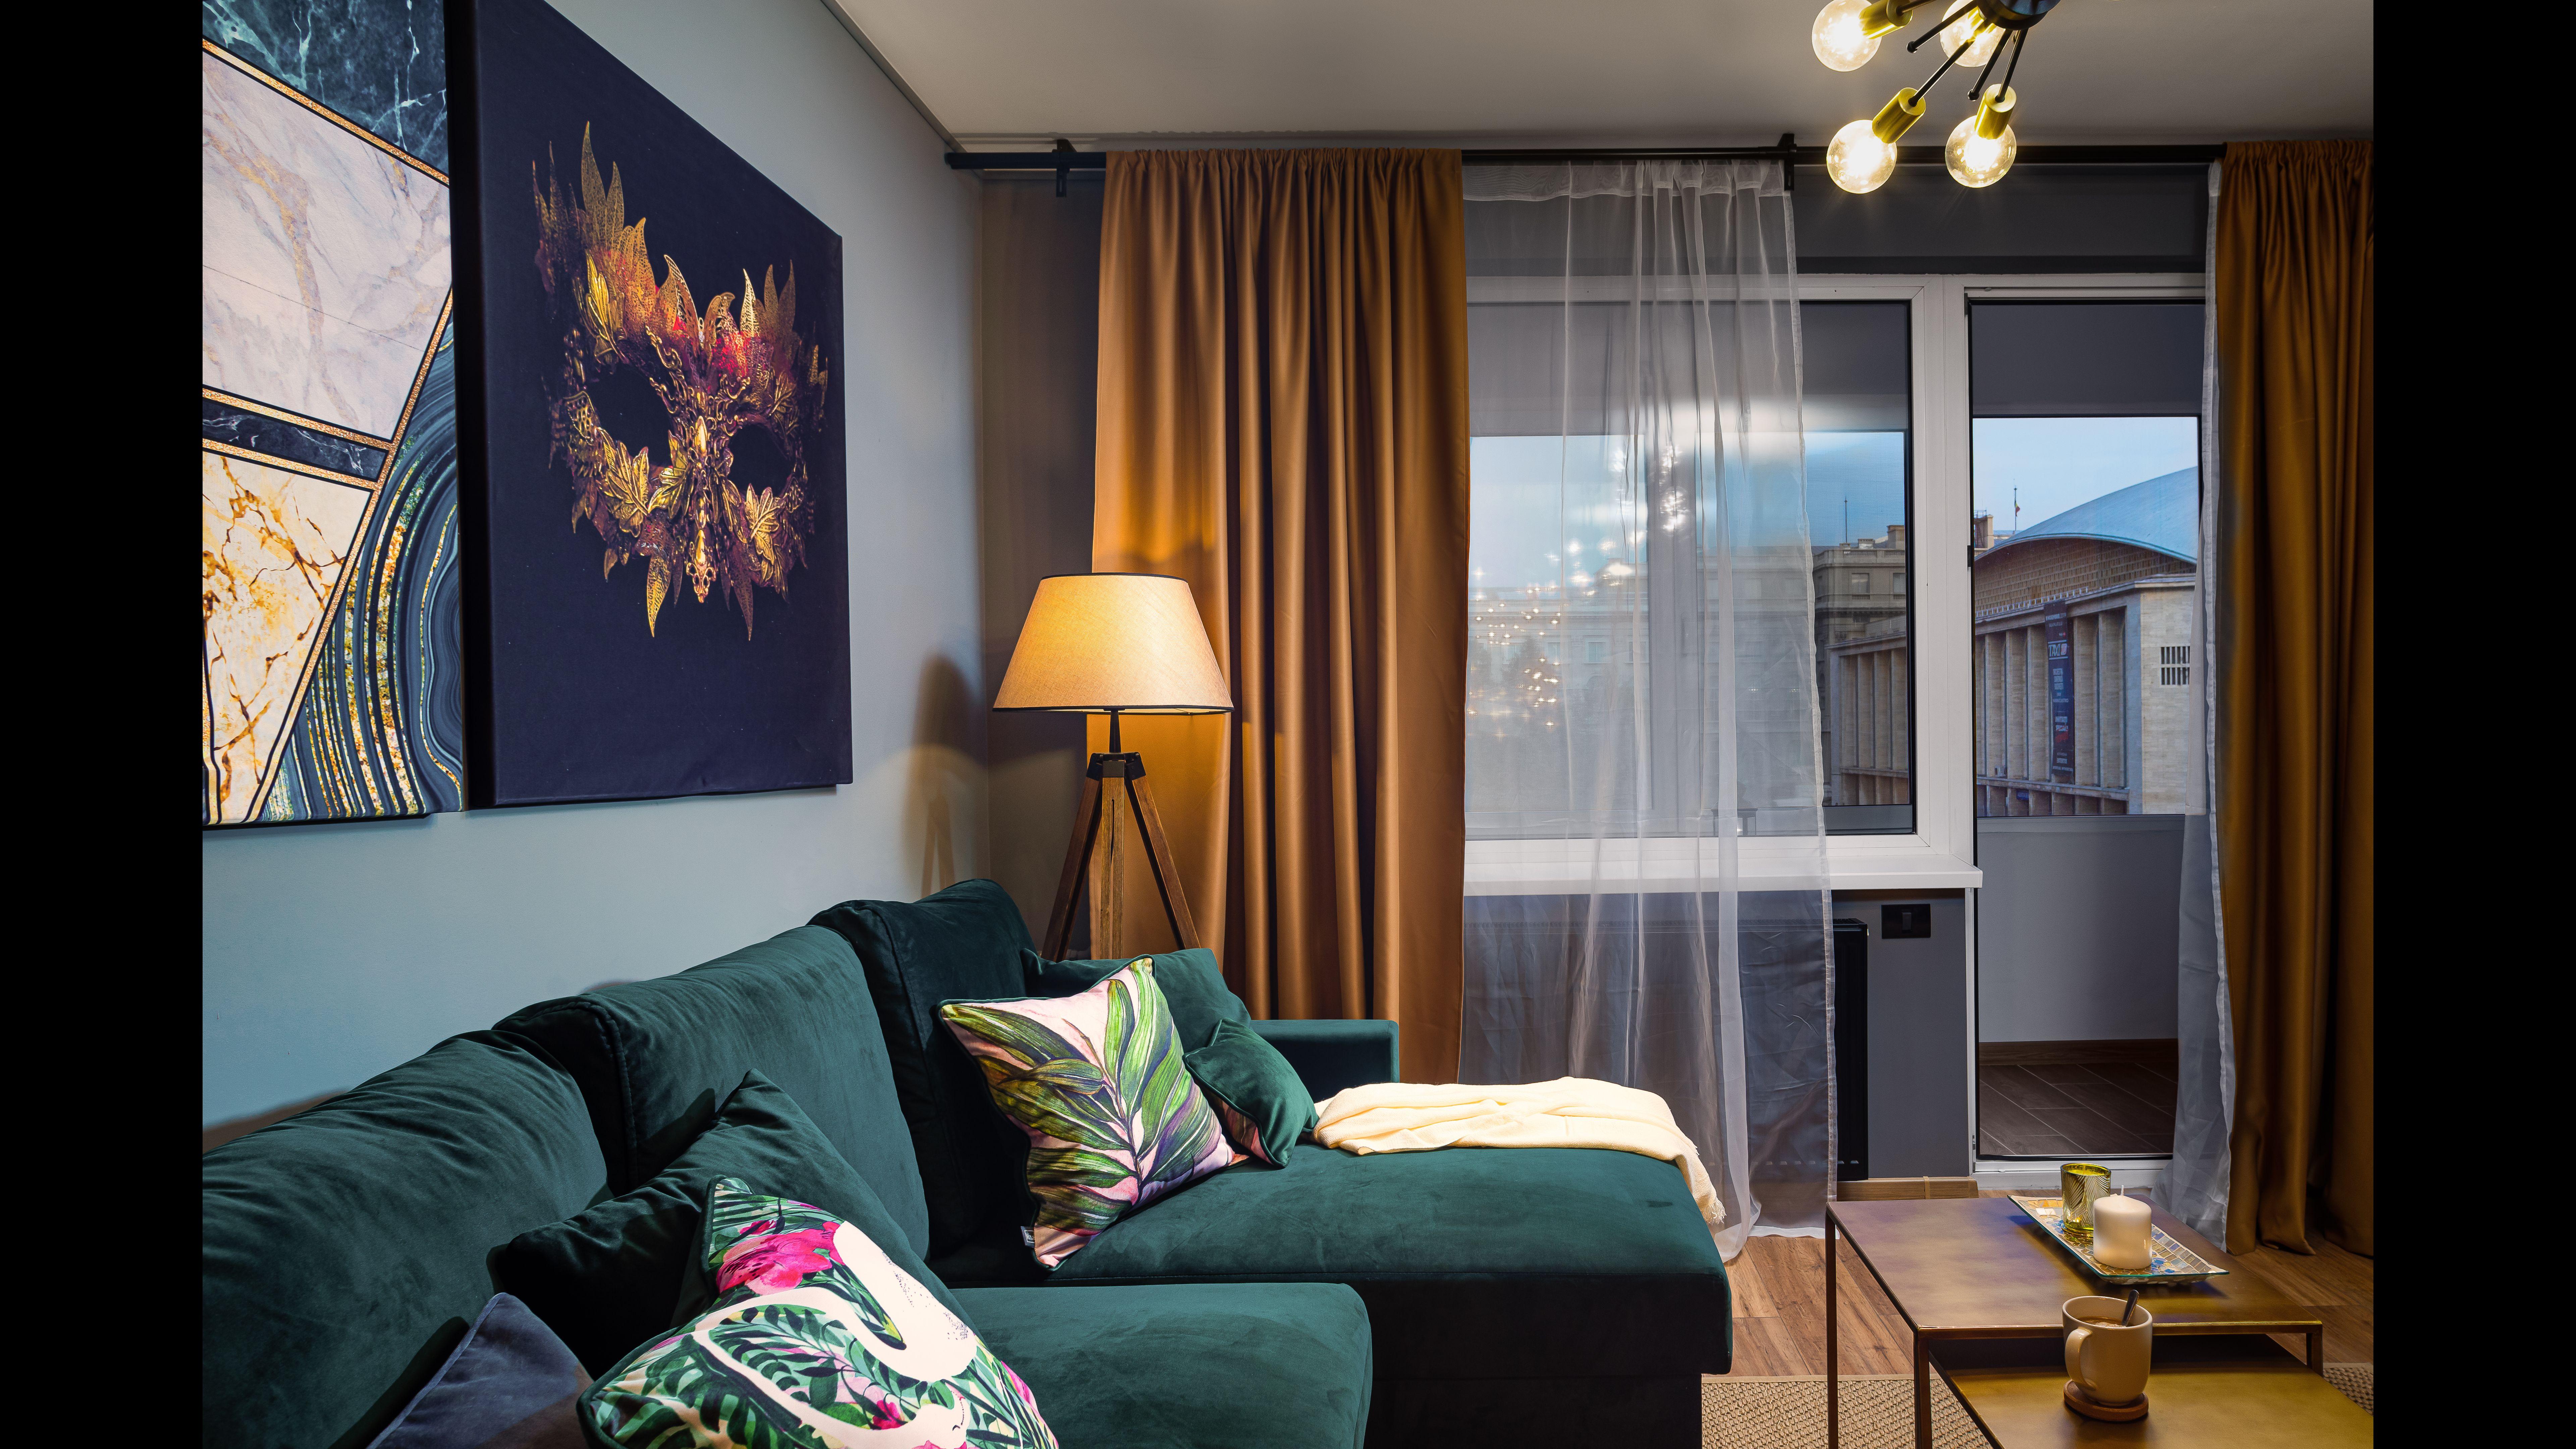 Golden Hour Apartment - Cismigiu Garten